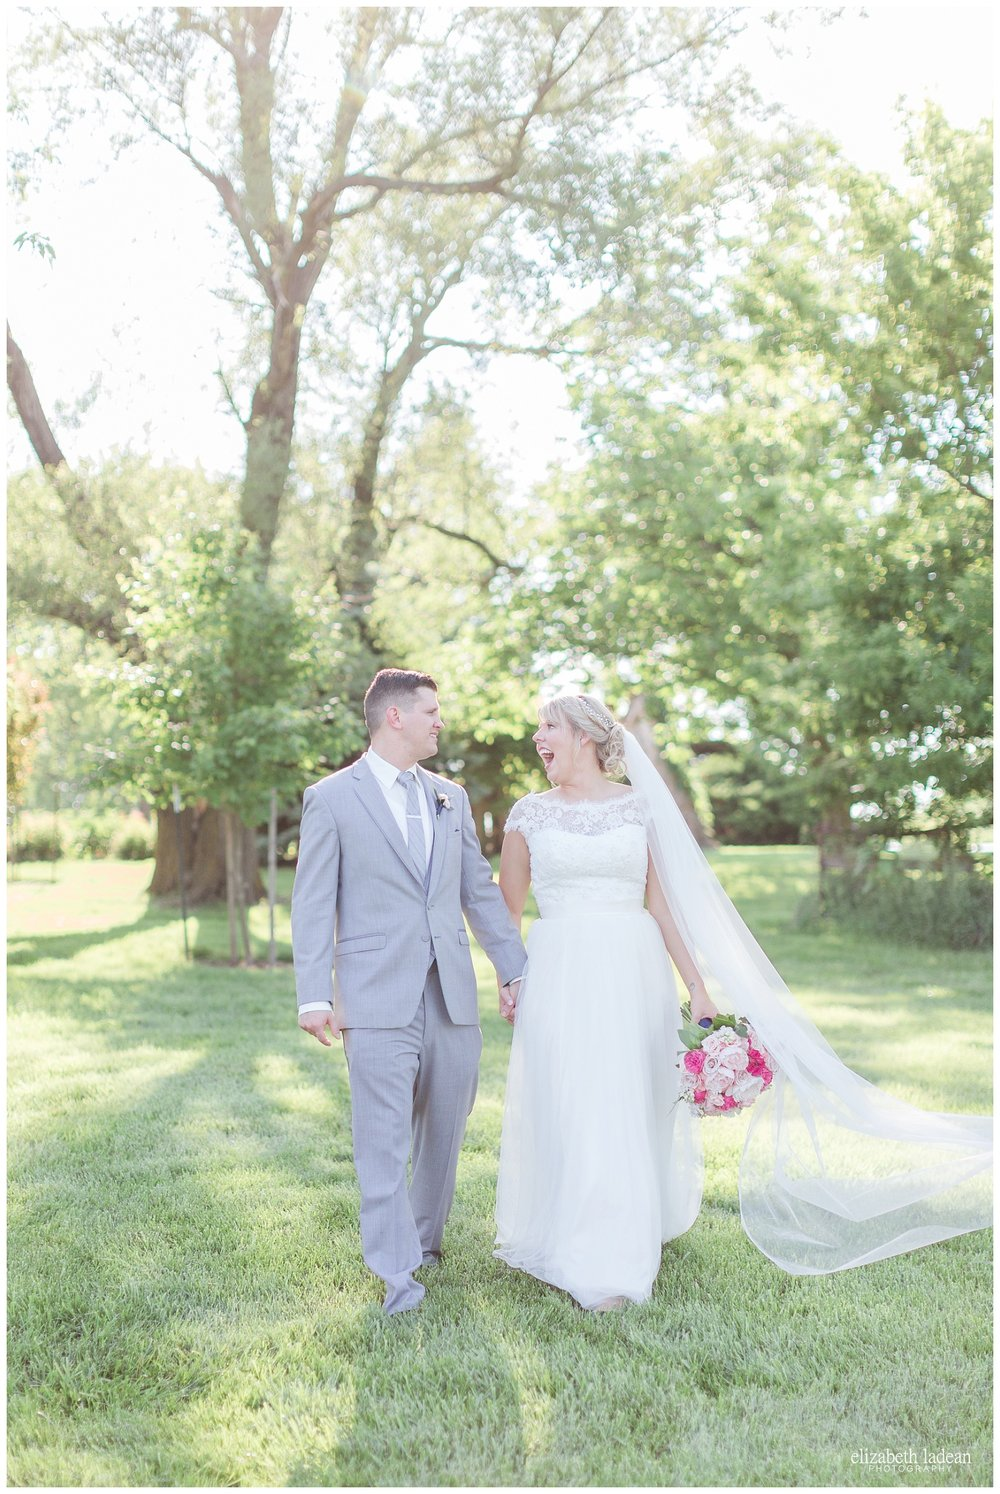 Kansas-City-KC-Wedding-Photographer-2017BestOf-Elizabeth-Ladean-Photography-photo-_5962.jpg